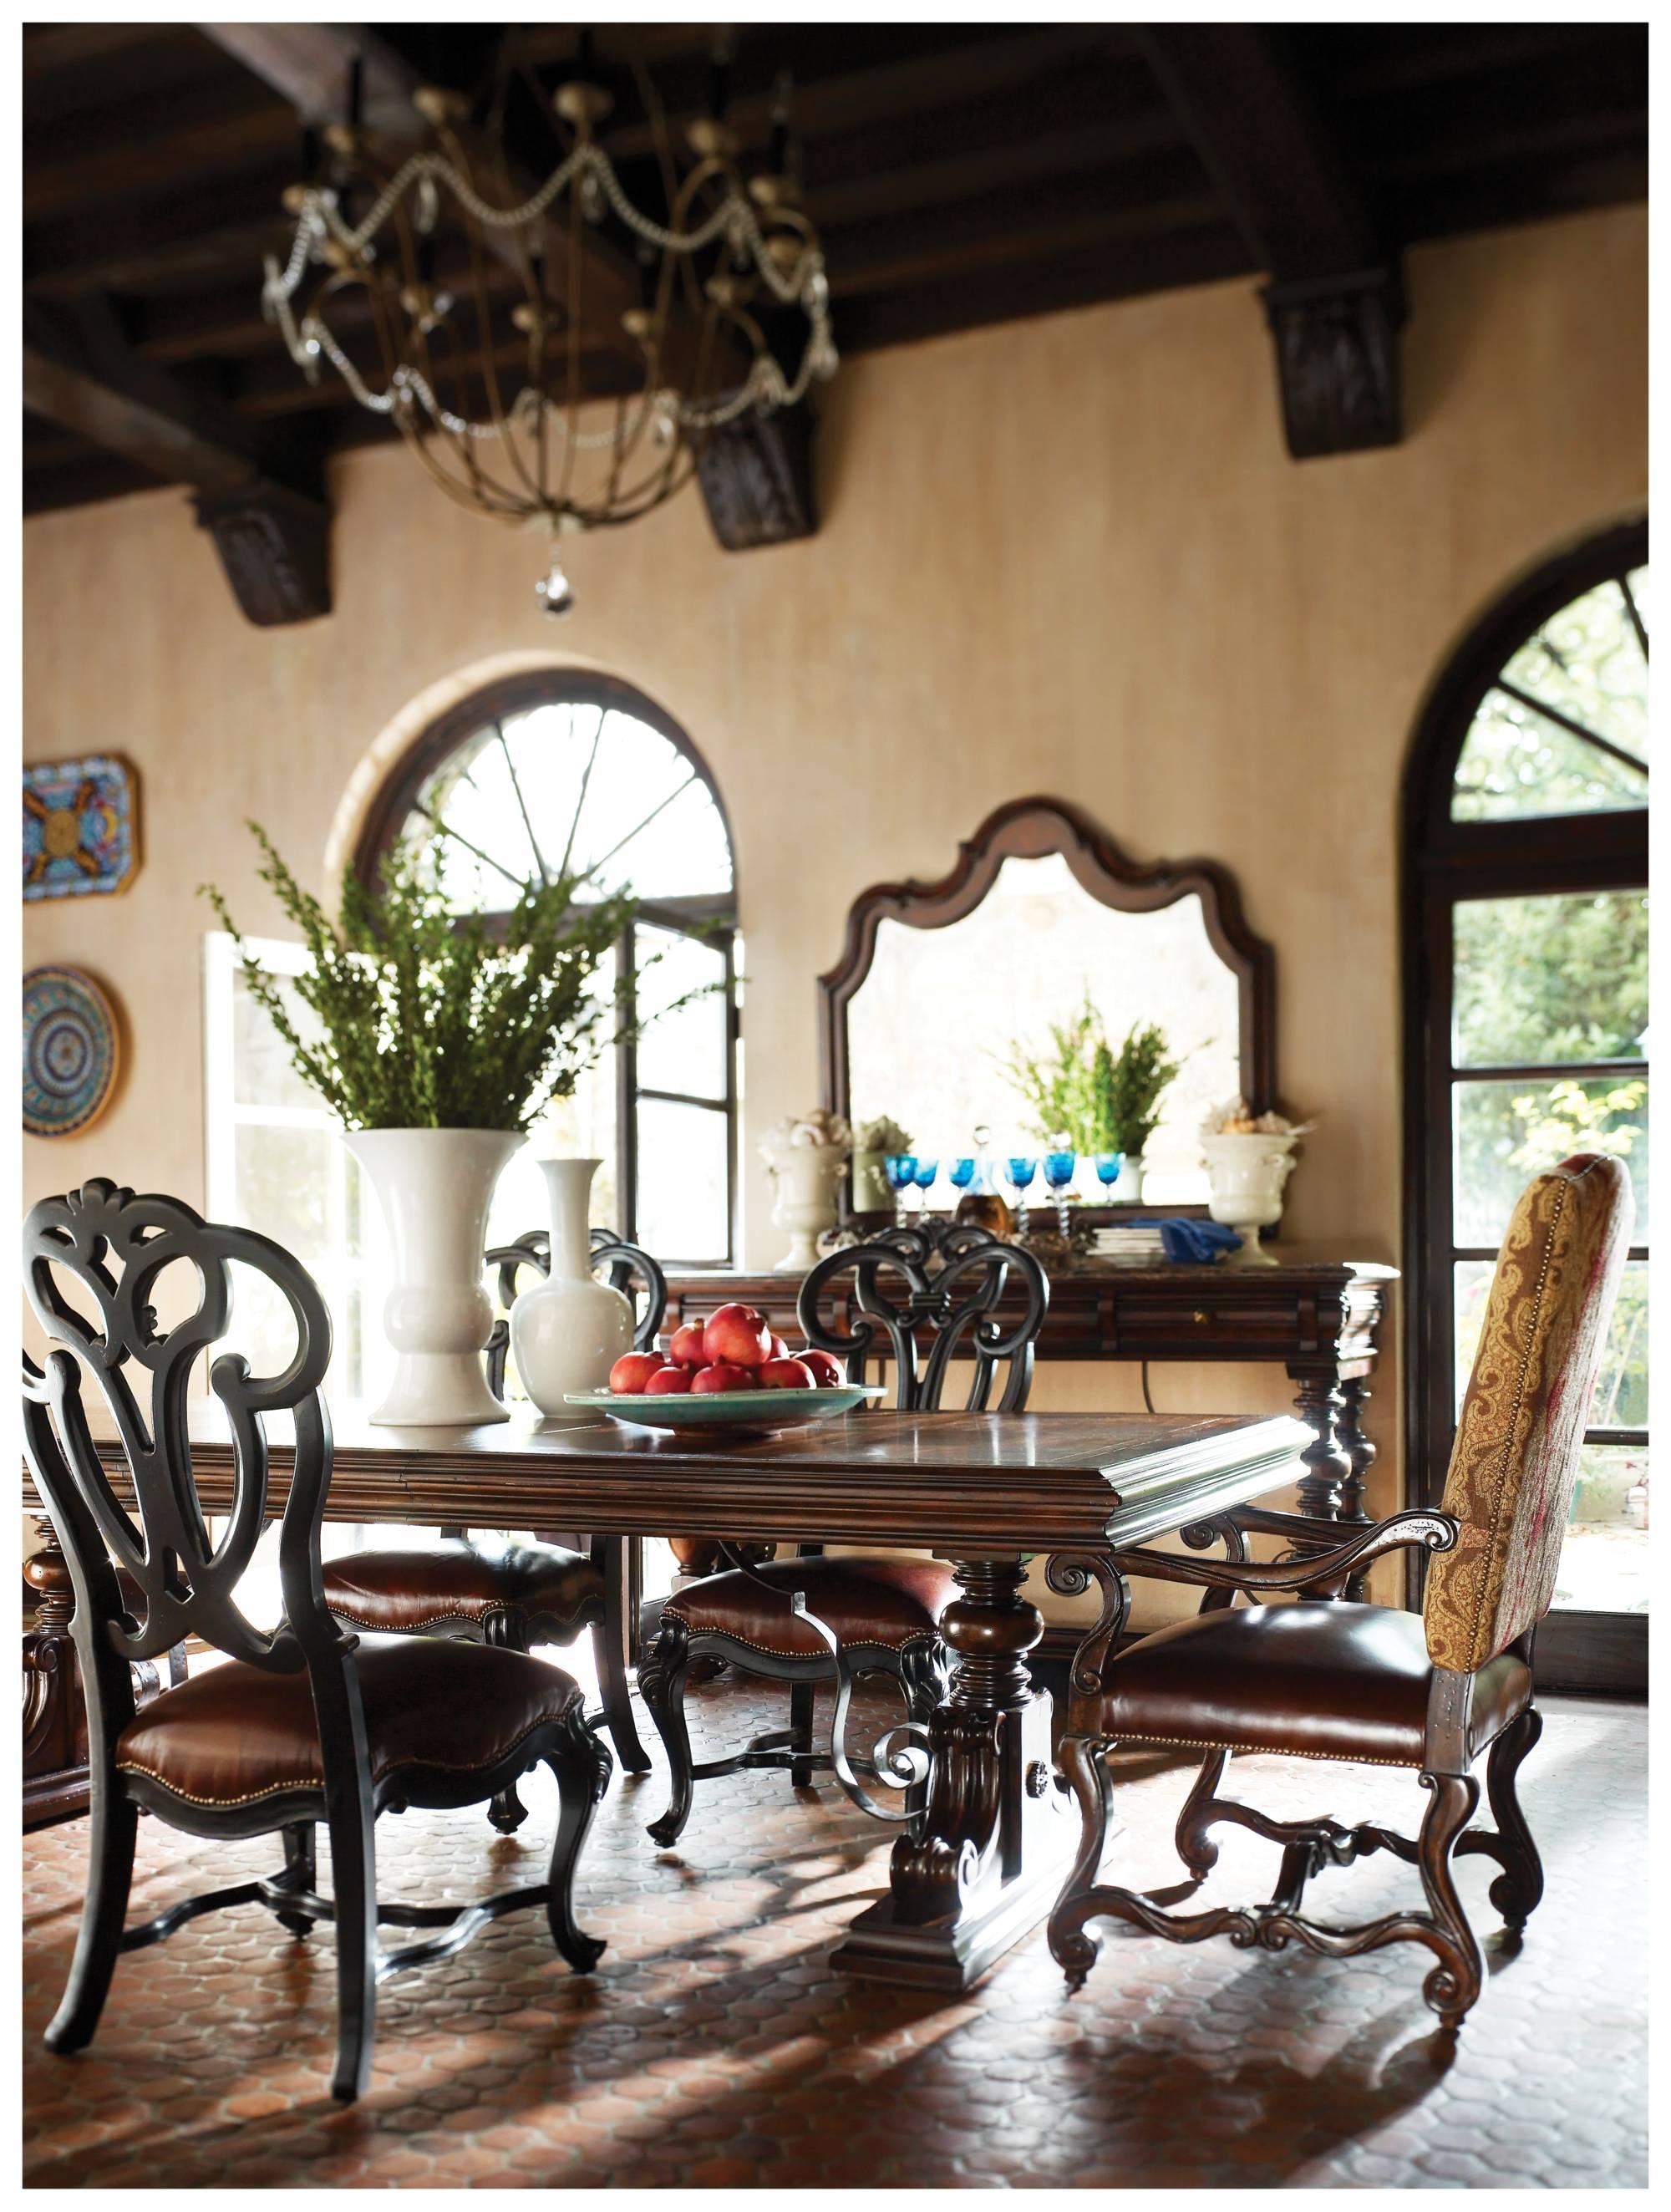 Stanley Furniture Costa del Sol Formal Dining Room Group - Item Number: 971 Dining Room Group 1